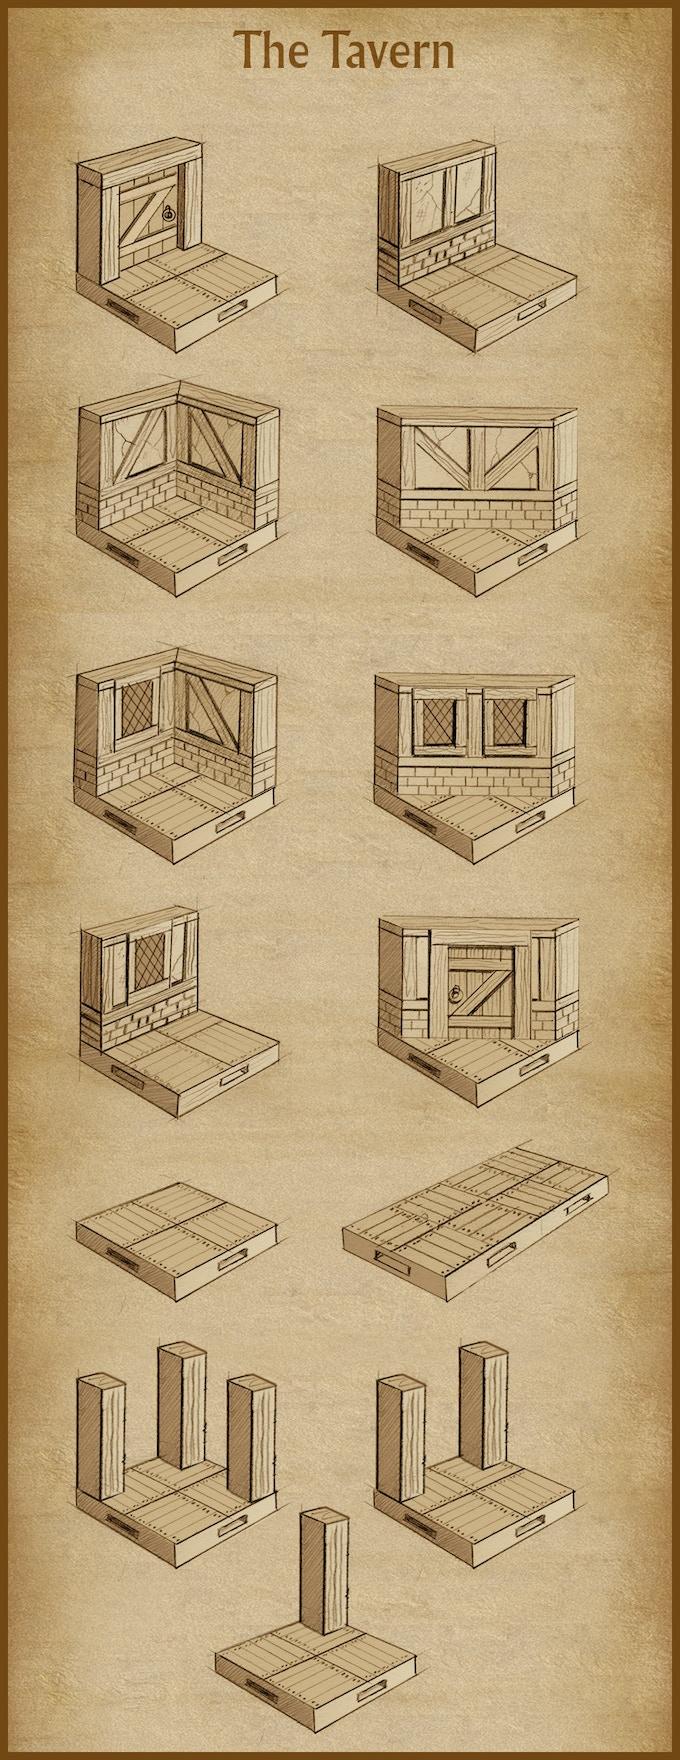 'The Tavern' terrain set (final design subject to change).